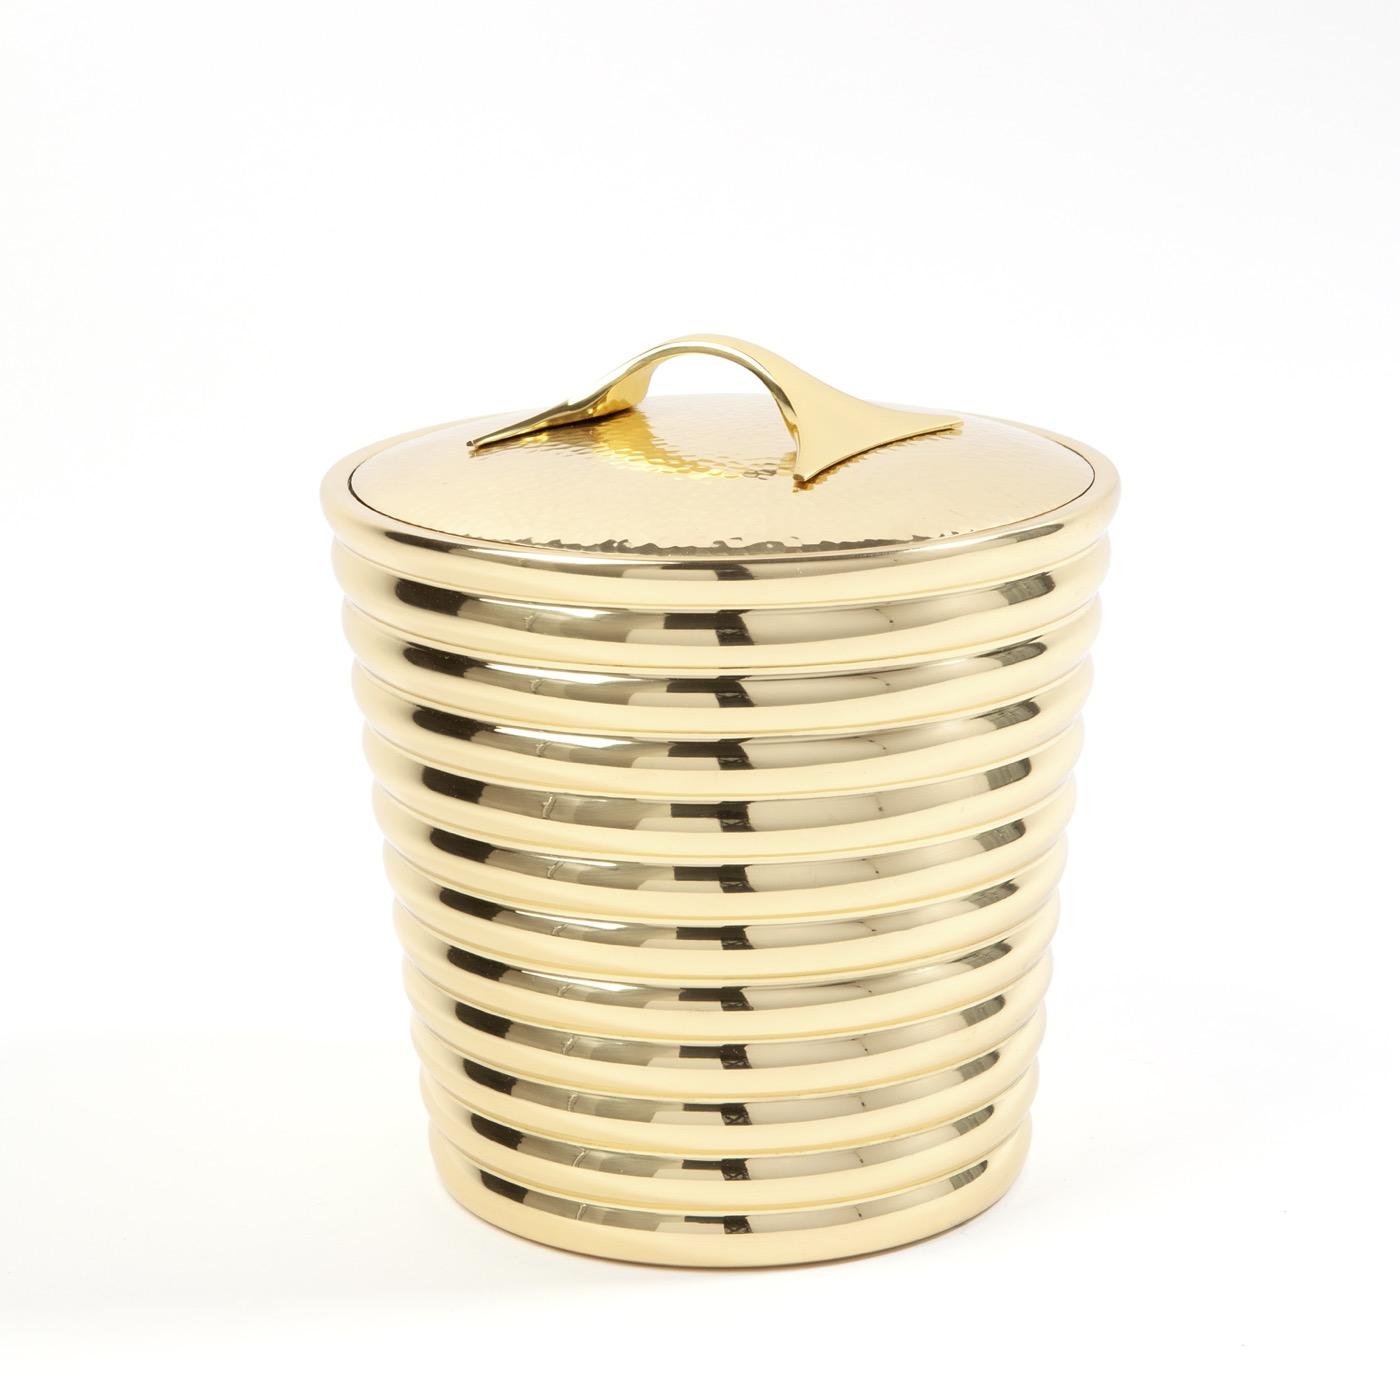 Bette Brass Ice Bucket